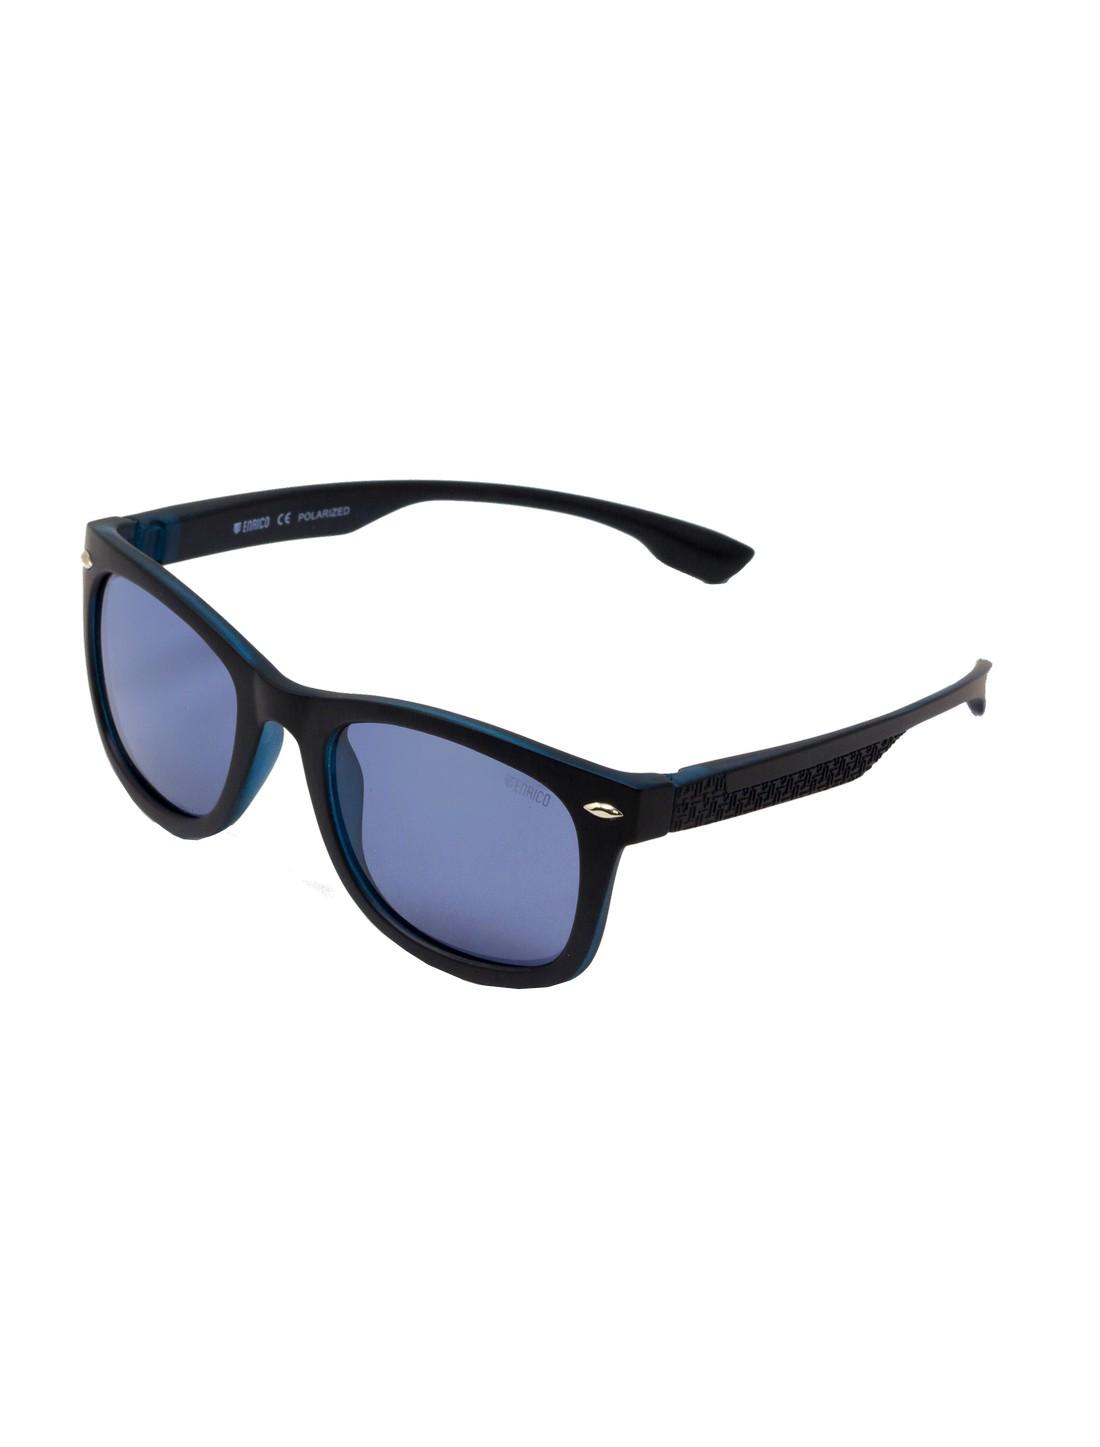 ENRICO   ENRICO Nudo UV Protected Wayfarer Sunglasses for Men ( Lens - Blue   Frame - Black)